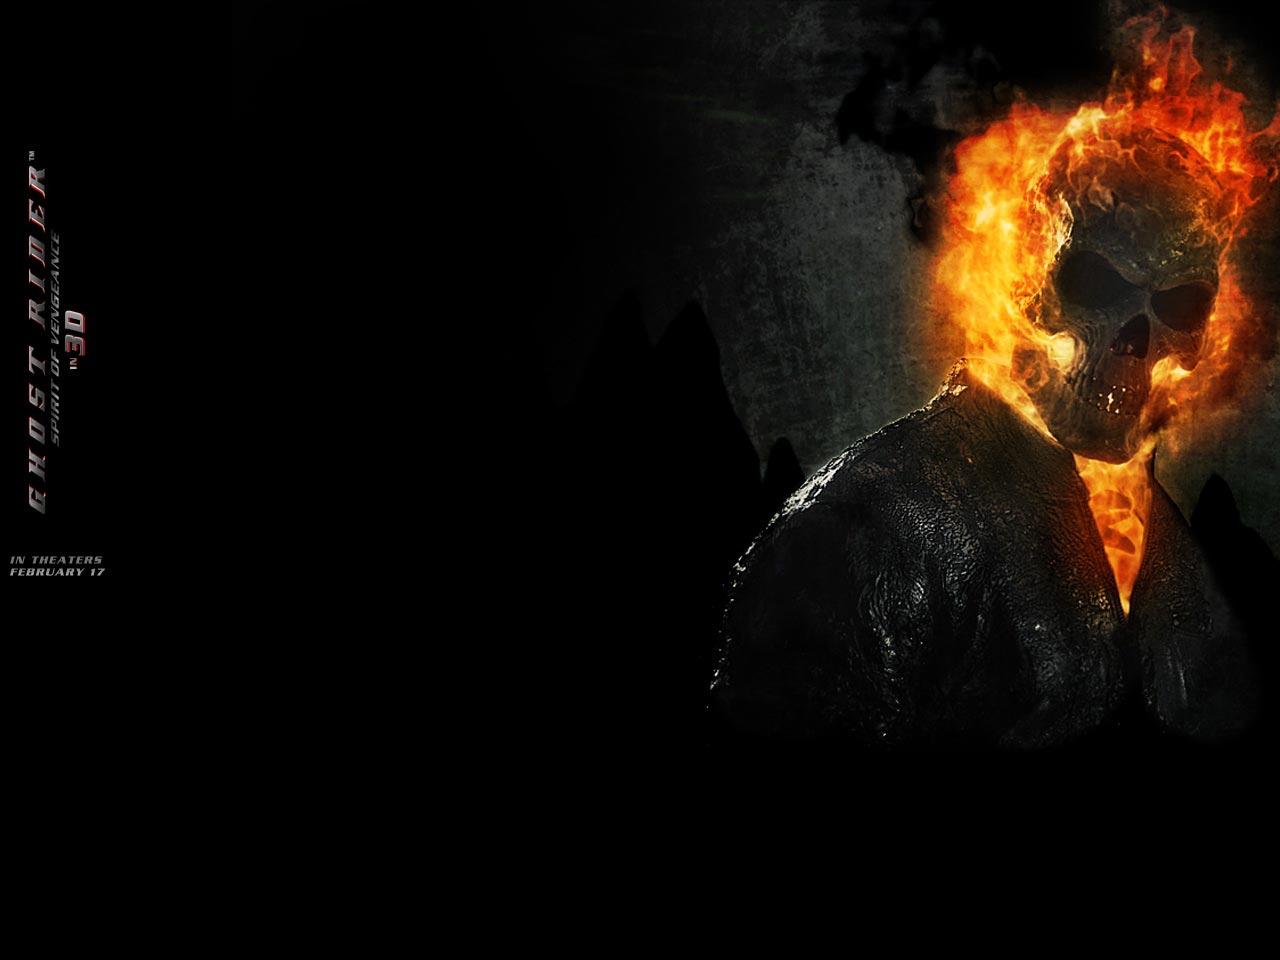 Ghost Rider Spirit Of Vengeance Wallpapers Filmofilia